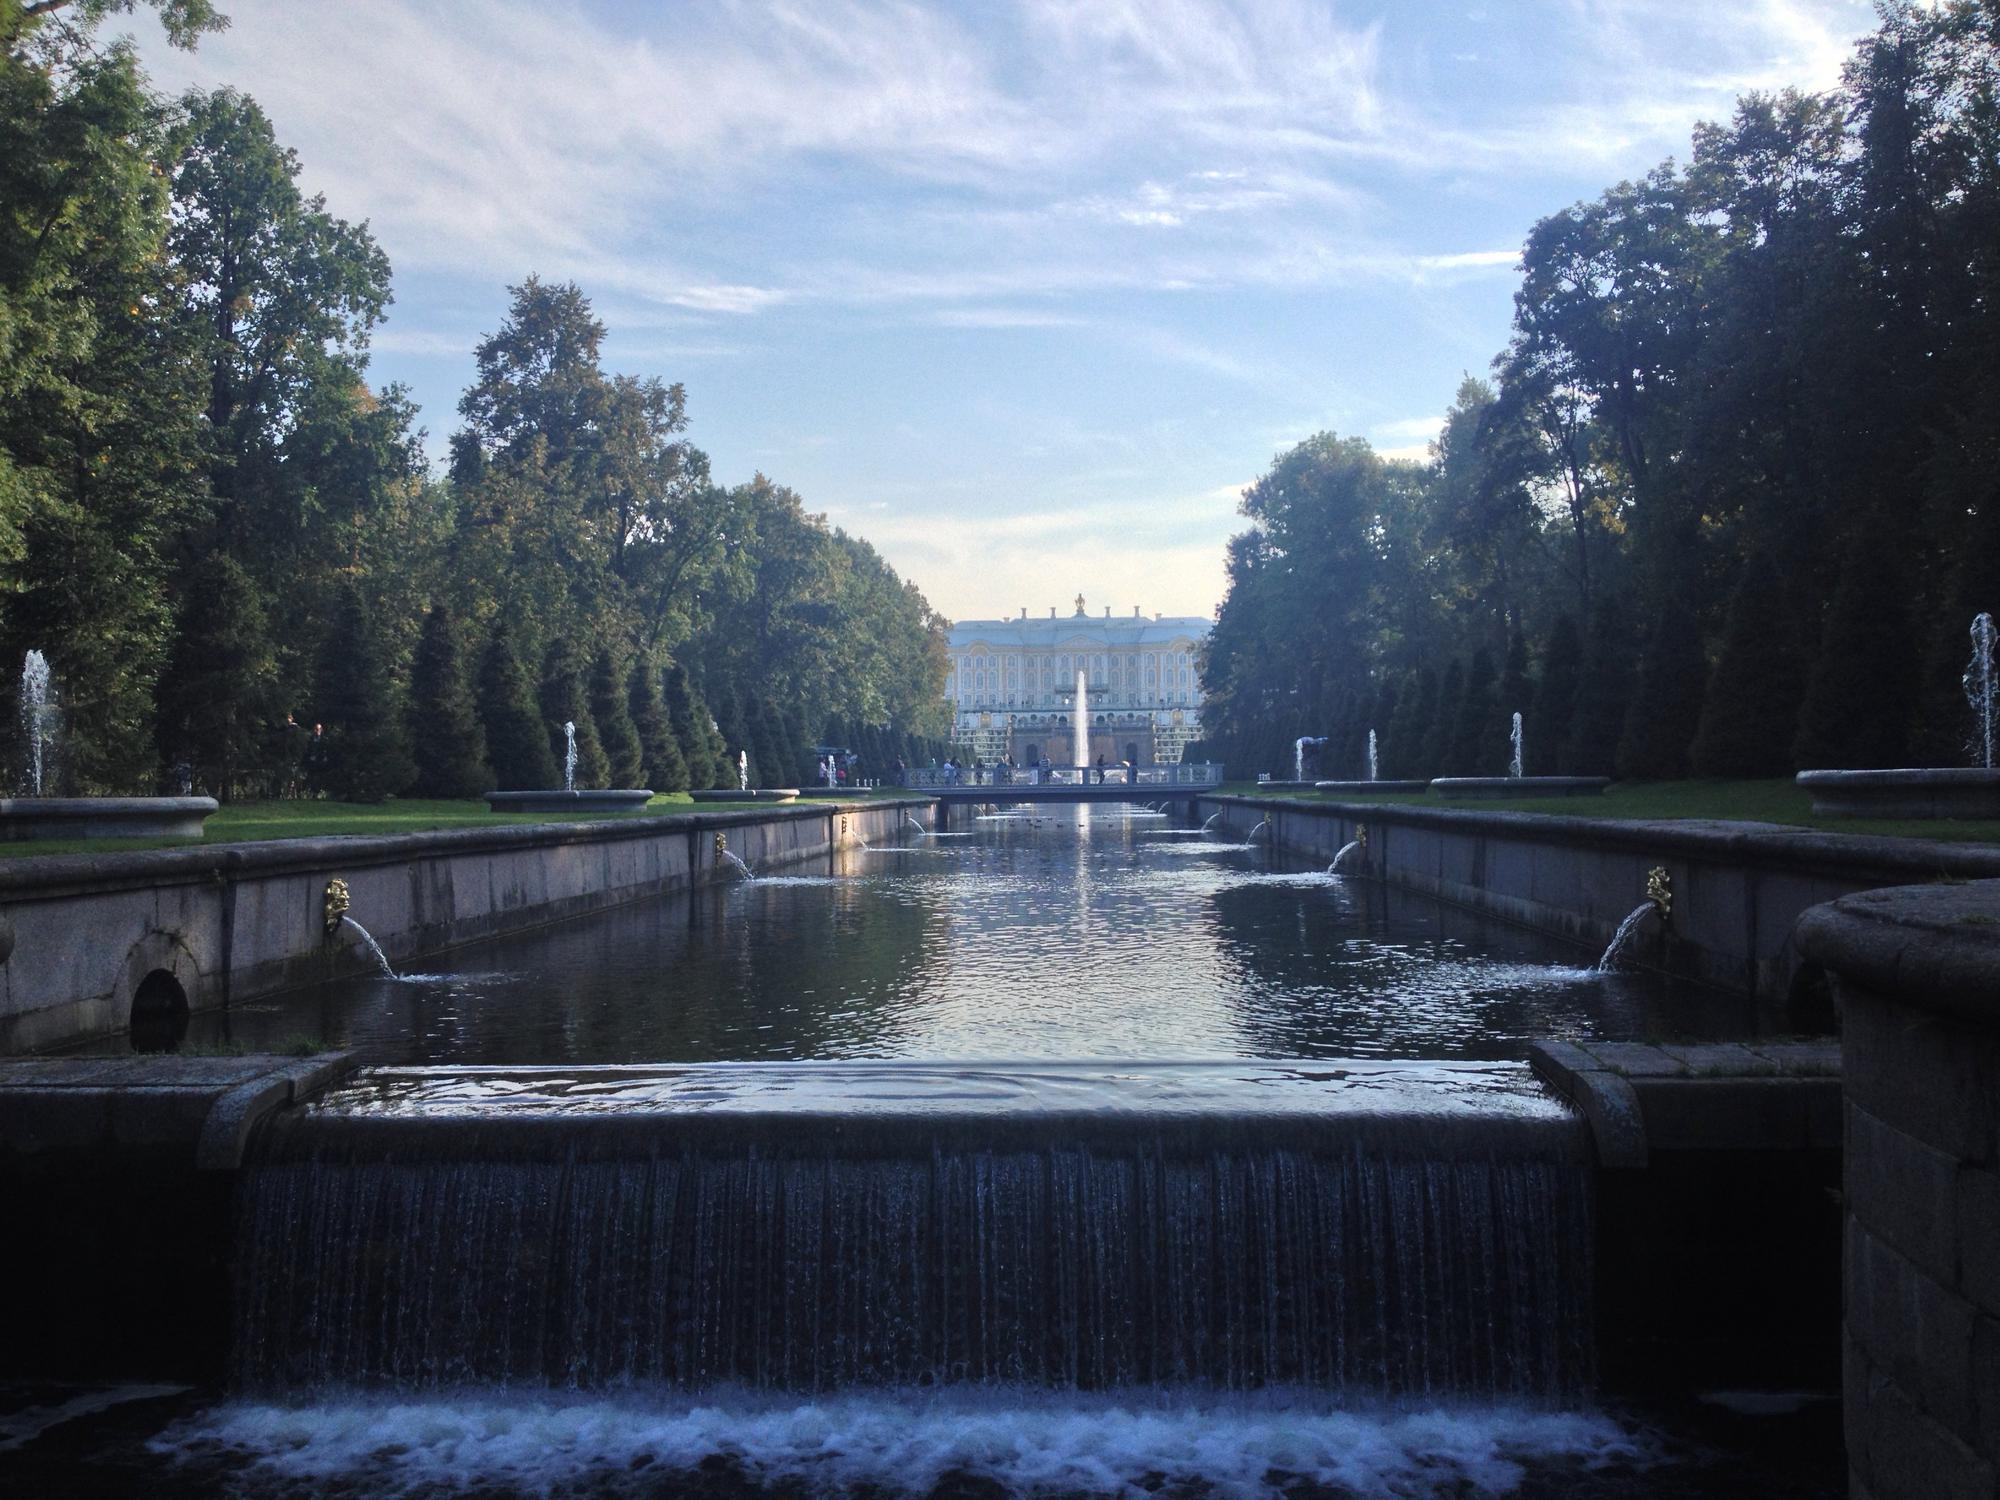 🇷🇺 Санкт-Петербург, Россия, сентябрь 2014.